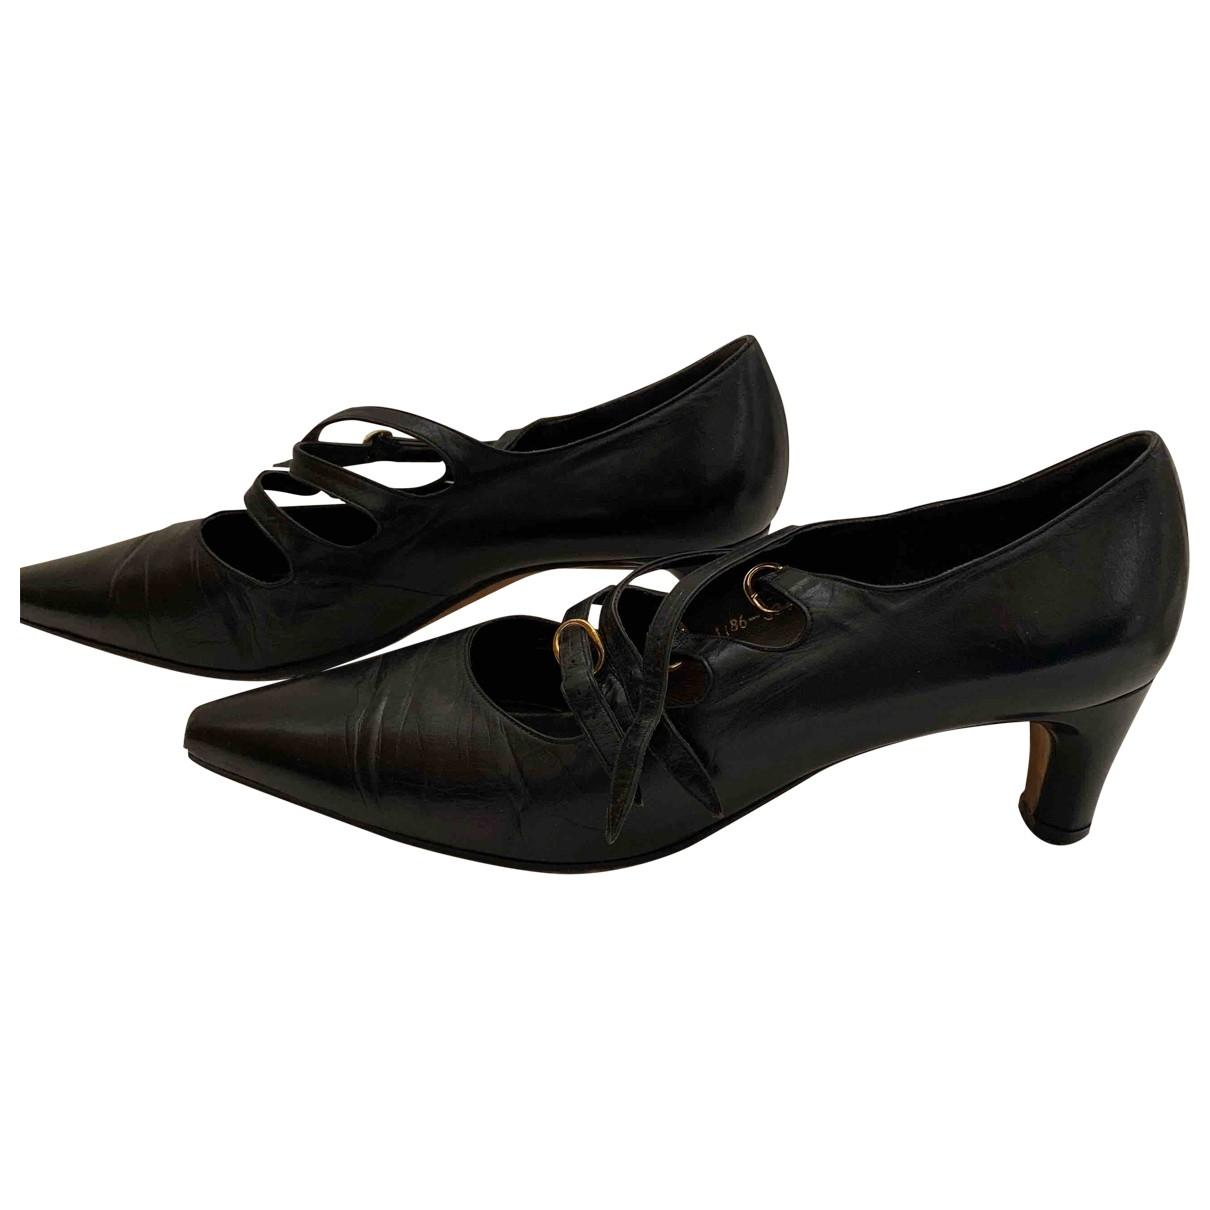 Gina \N Black Leather Heels for Women 5 UK